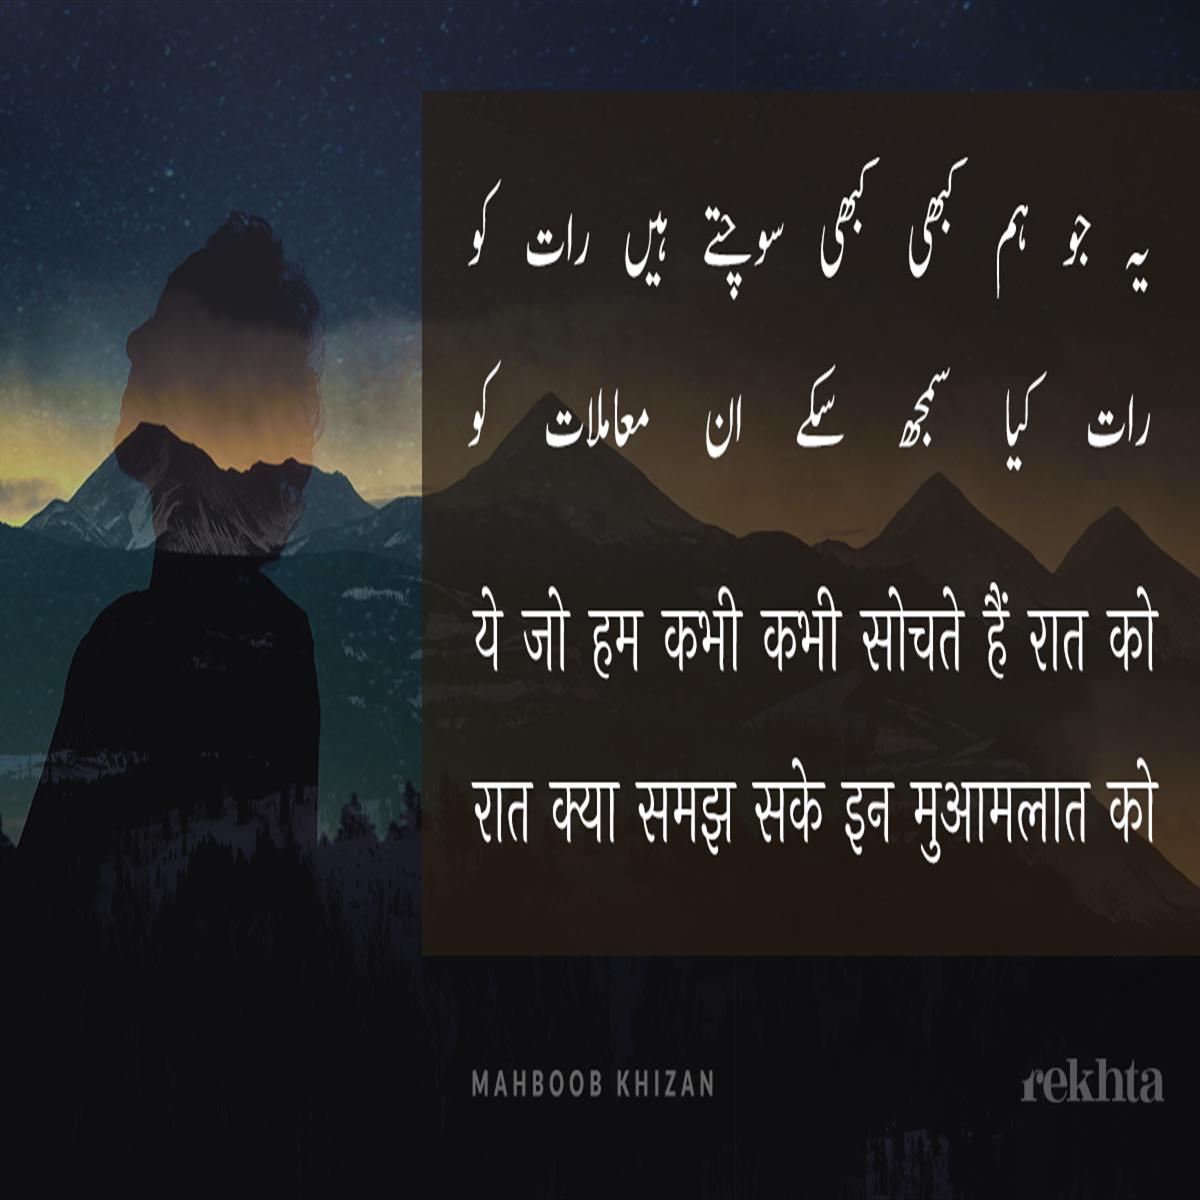 Mahboob Khizan